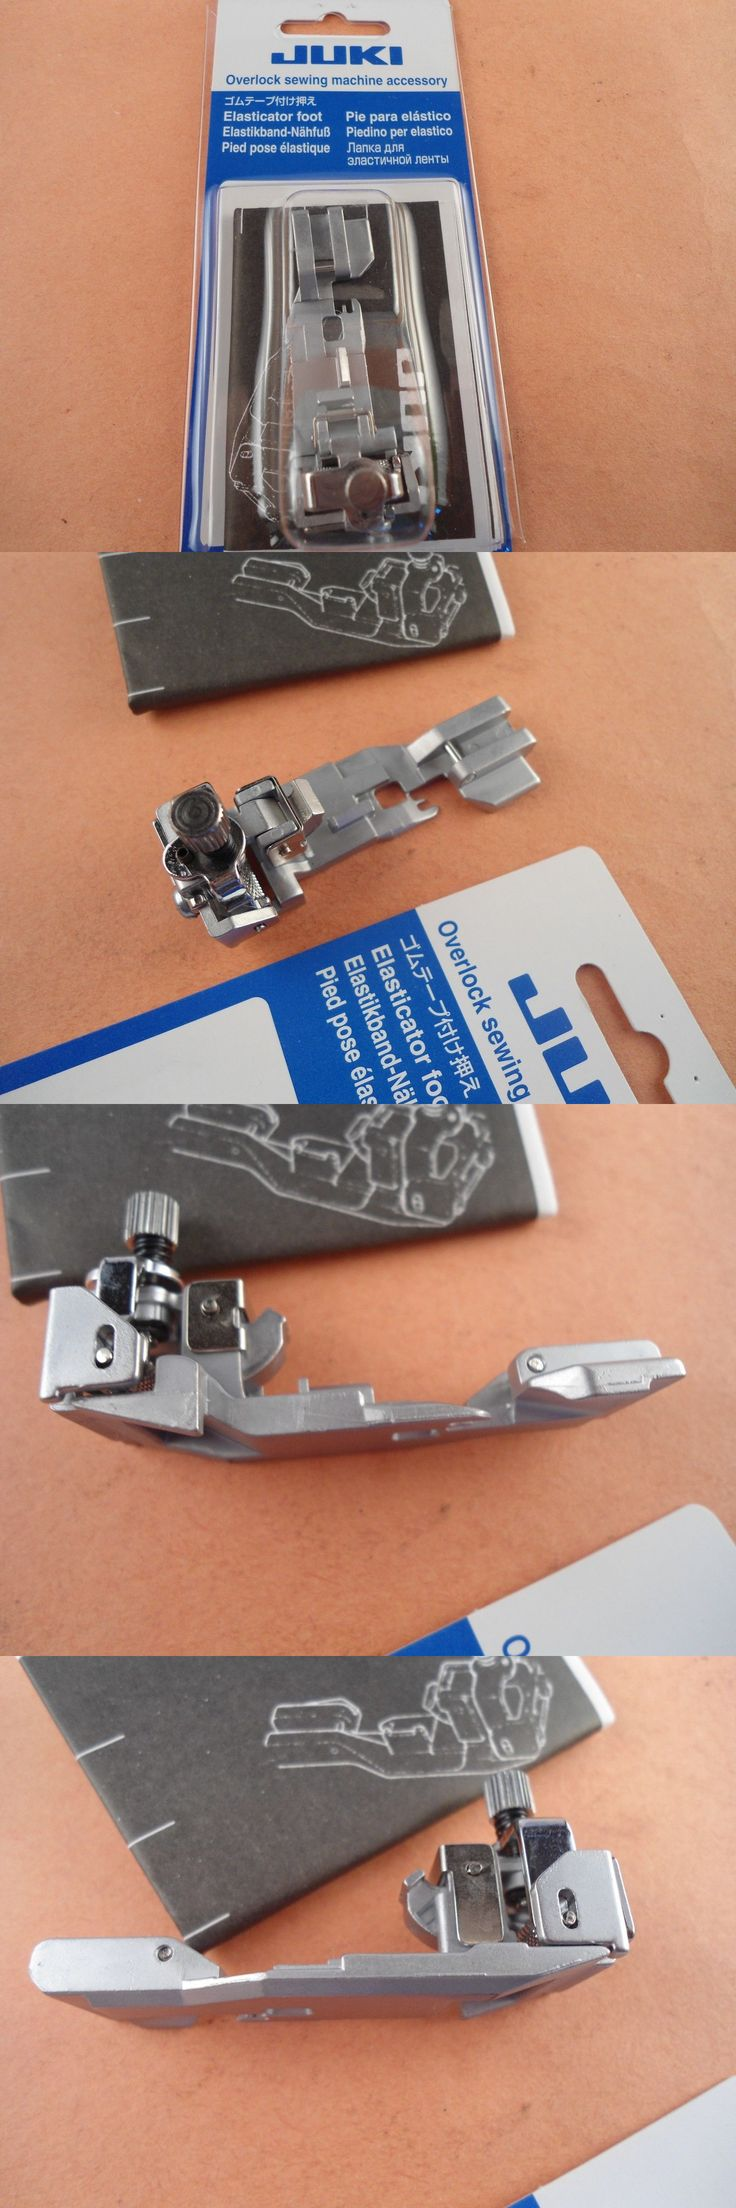 Sewing Machine Needles 41247: Genuine Elasticator Foot Juki Serger Overlock Mo-1000 Series -> BUY IT NOW ONLY: $49.95 on eBay!